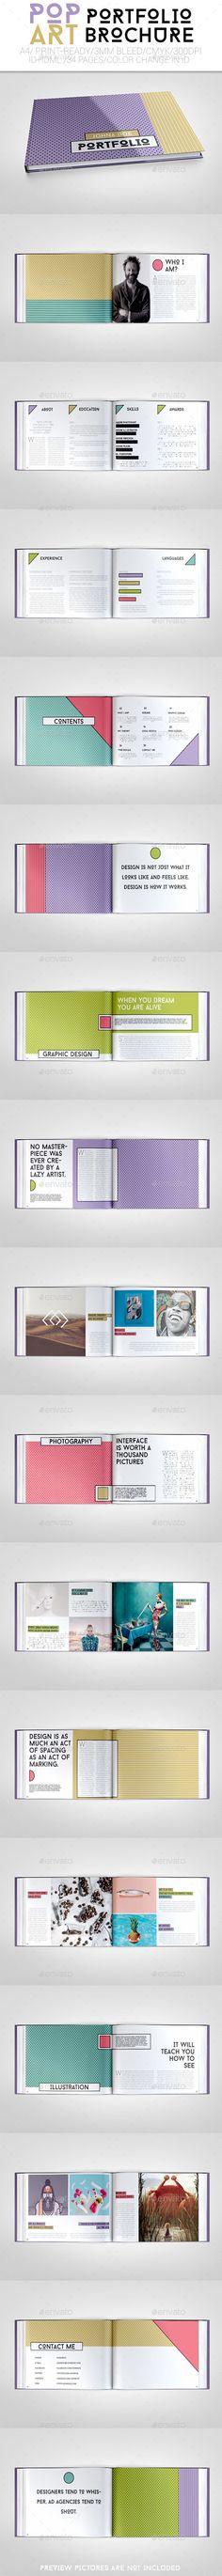 Pop Art Portfolio Brochure                                                                                                                                                                                 More